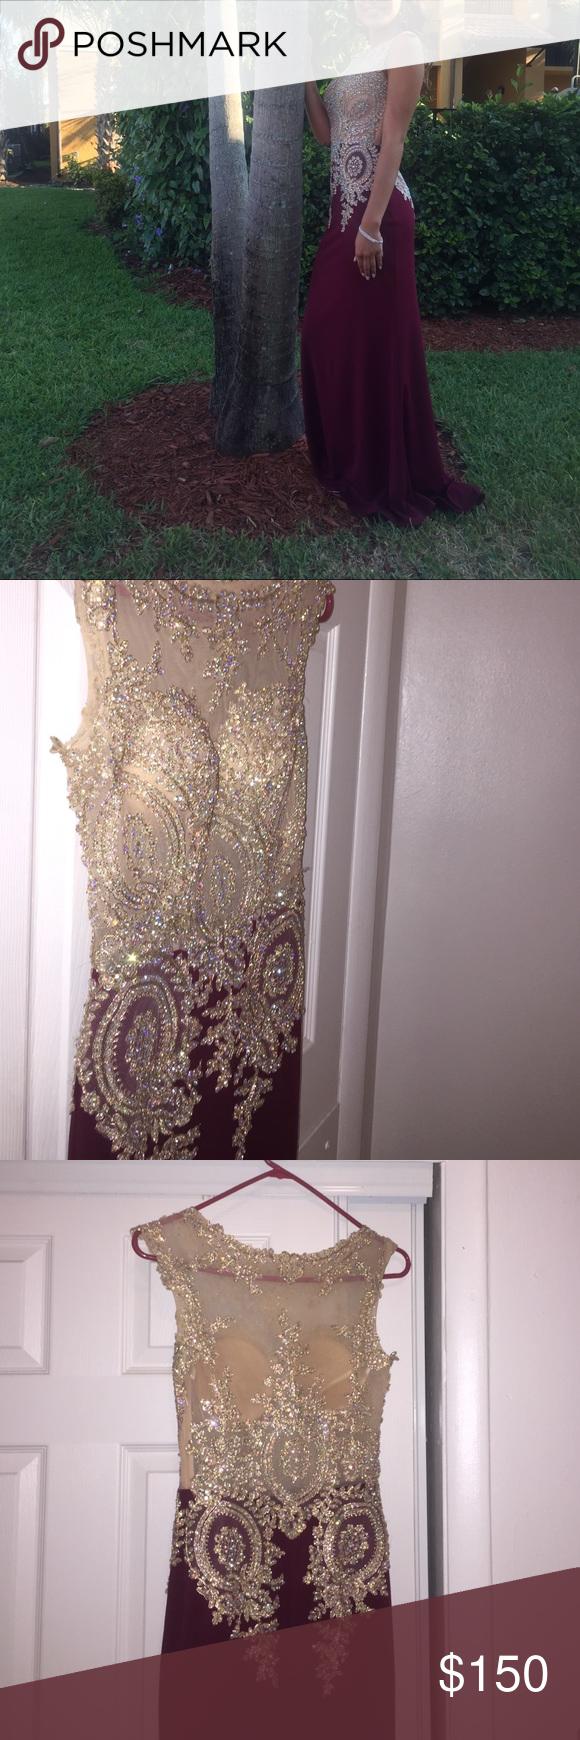 Prom dress nude top with iridescent rhinestones slim fit burgundy